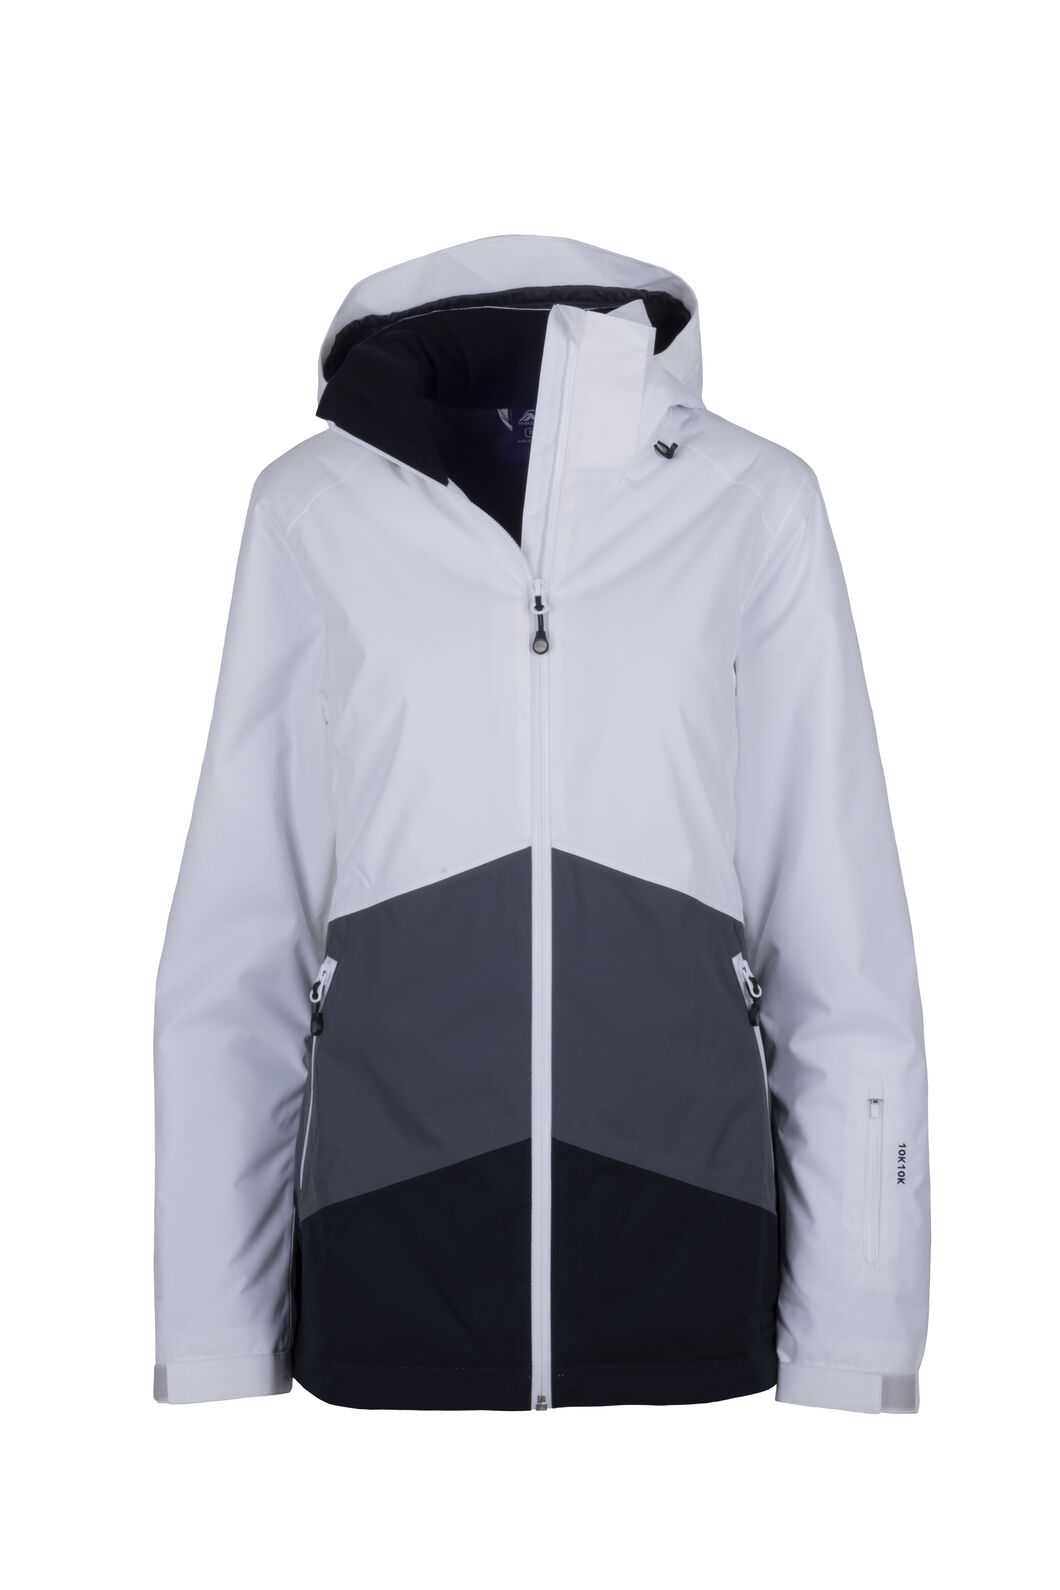 Macpac Slope Jacket - Women's, Iron Gate/White, hi-res